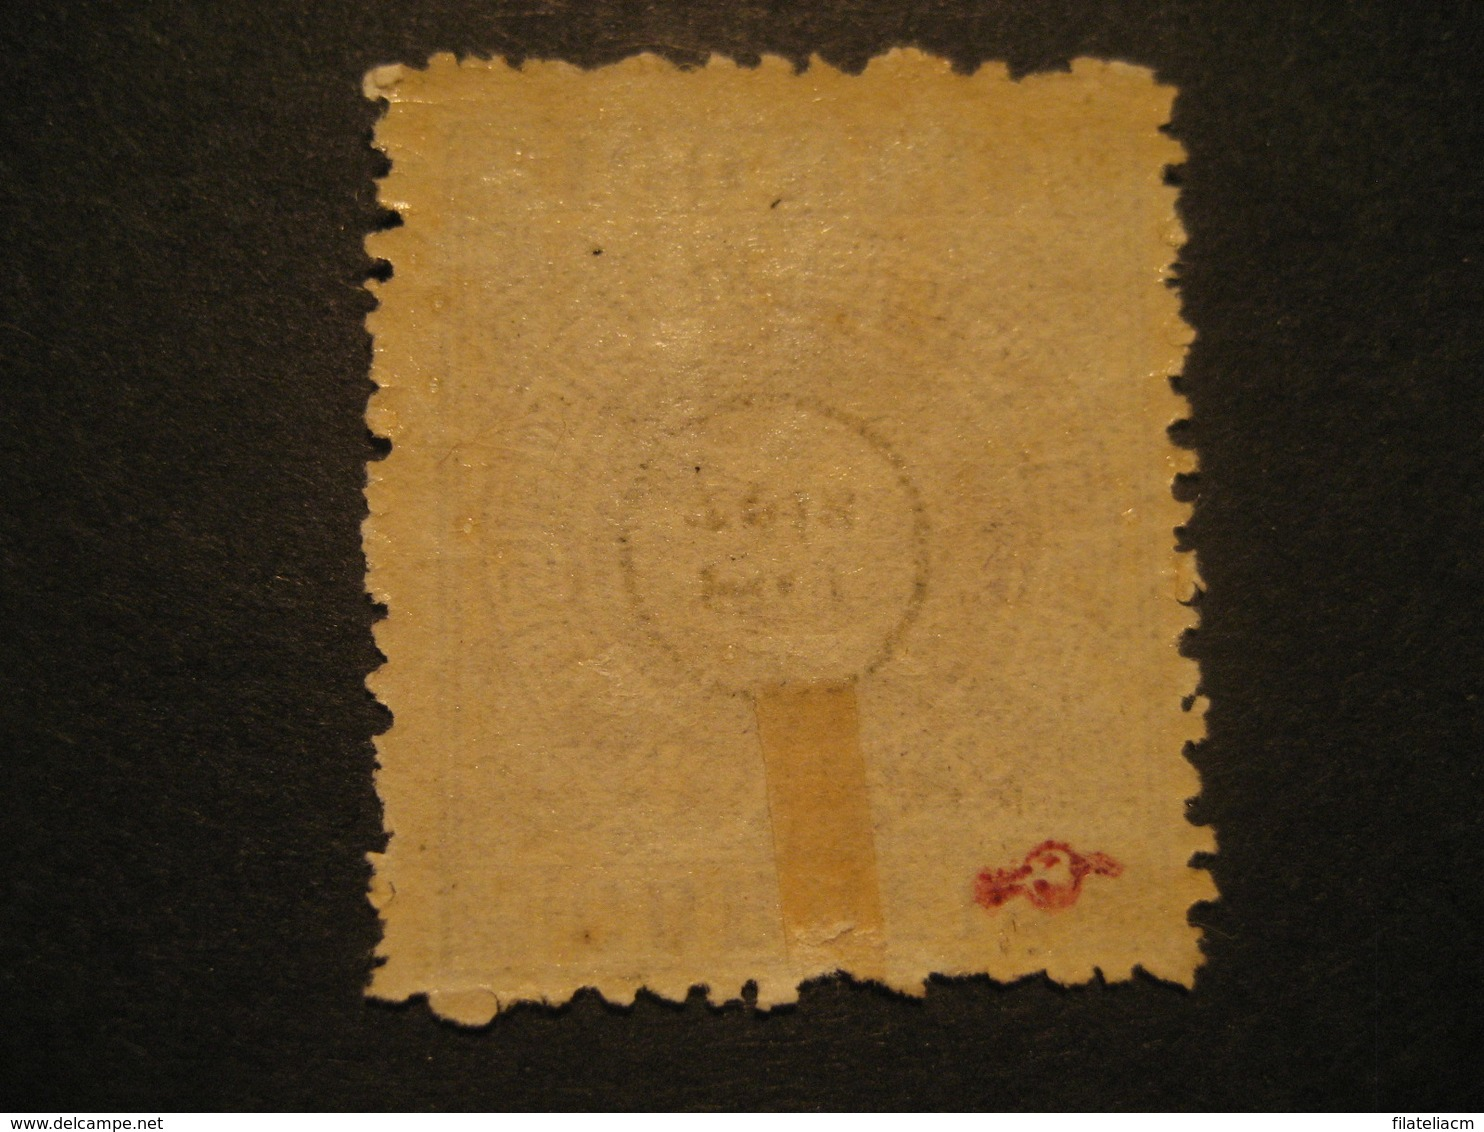 100 Reis O.p. 80 Reis 1884 MACAU Yvert 10 (Cat. Year 2008: 85 Eur) Mark Sign On Back Stamp Macao Portugal China Area - Neufs